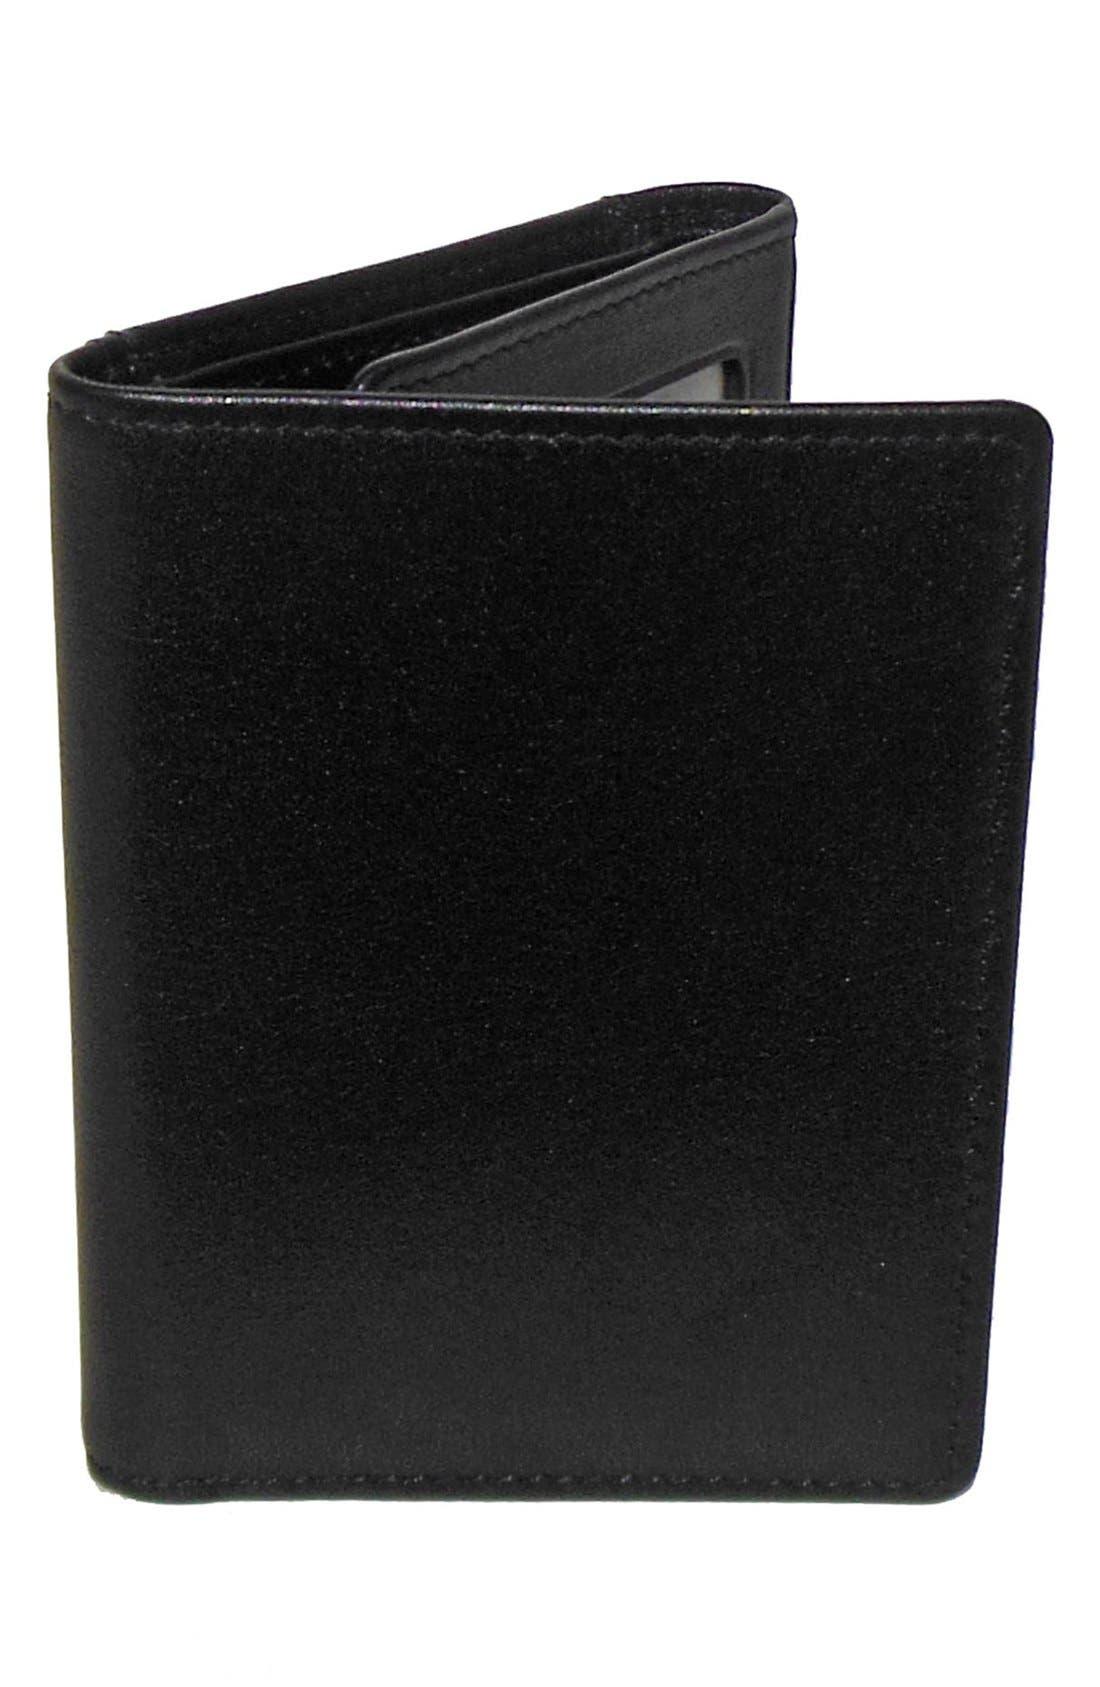 Main Image - Boconi 'Grant' RFID Blocker Leather Trifold Wallet